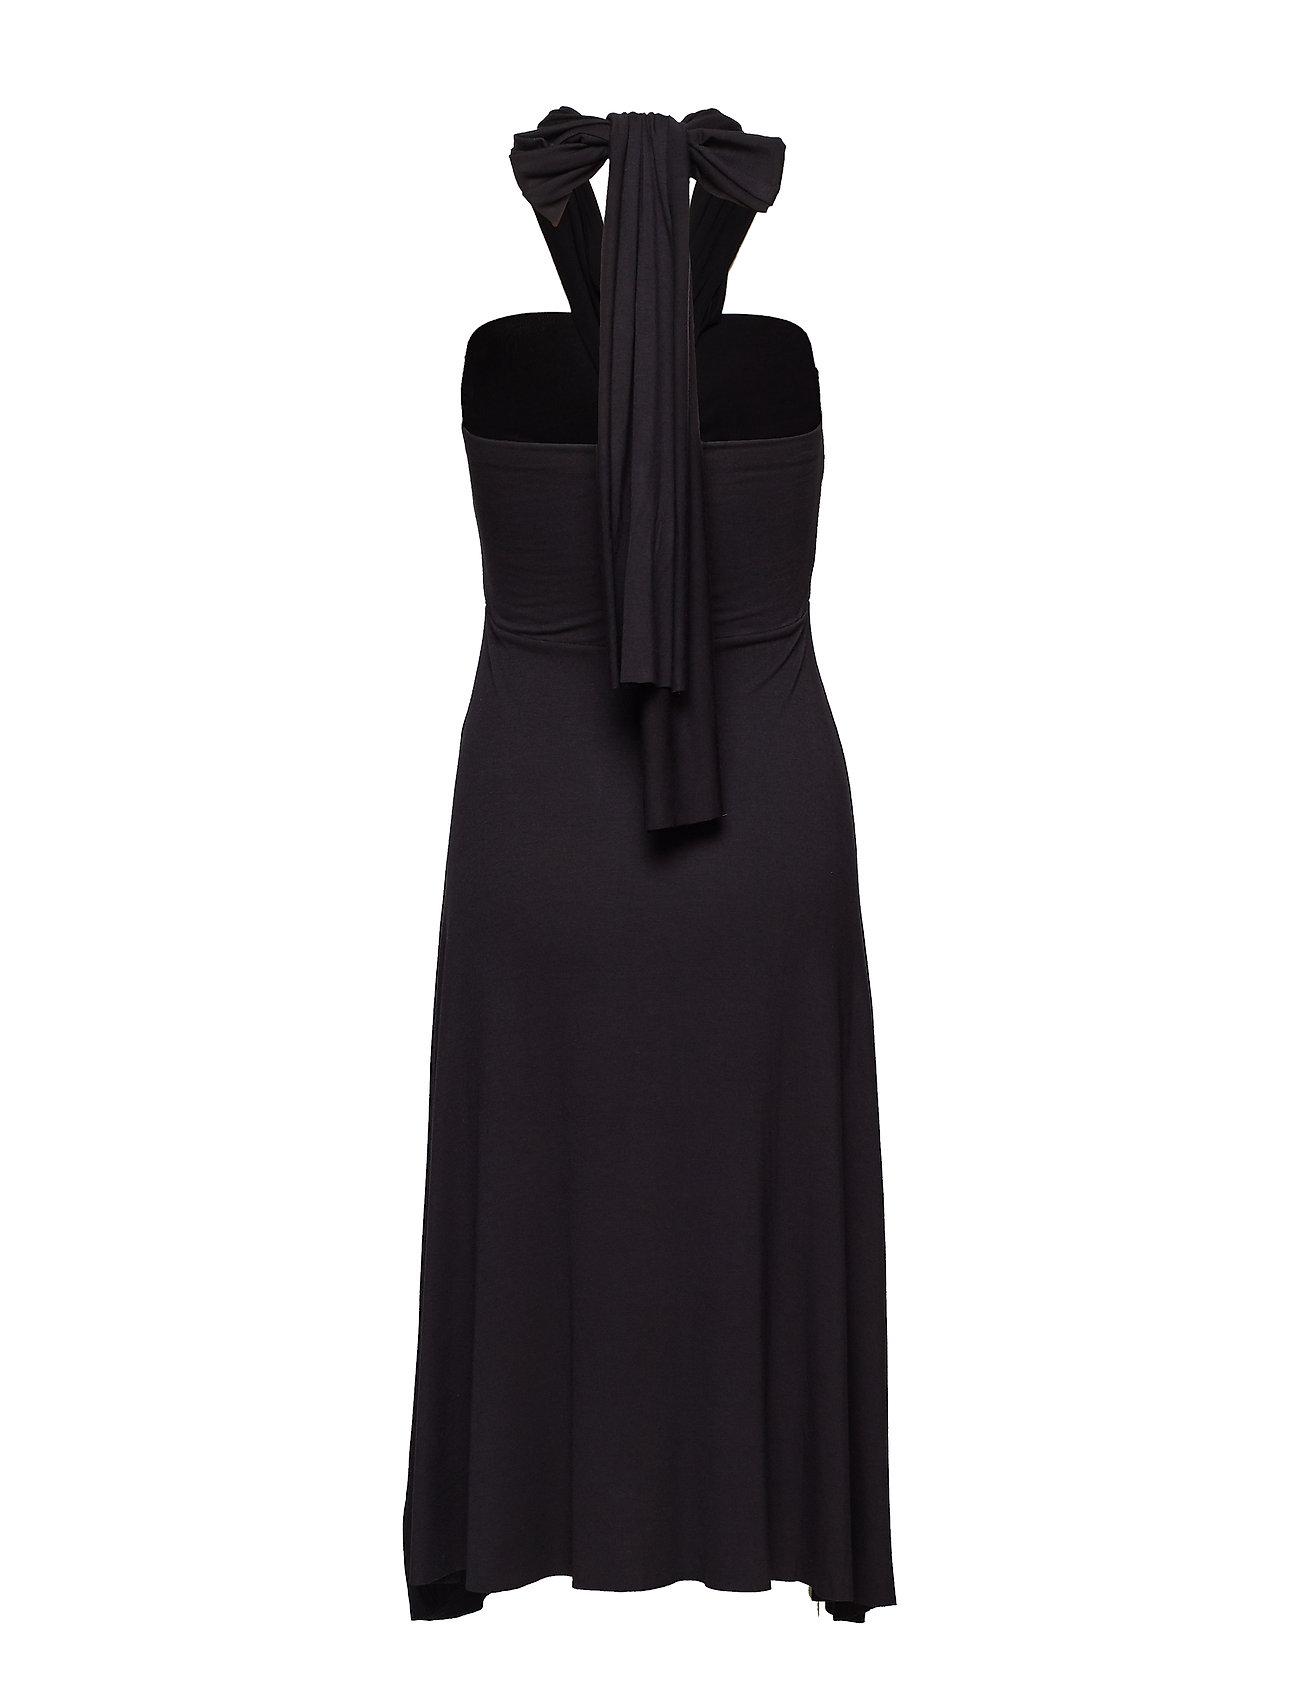 Wiki - Multifunction Bamboo beach dress - beachwear - black